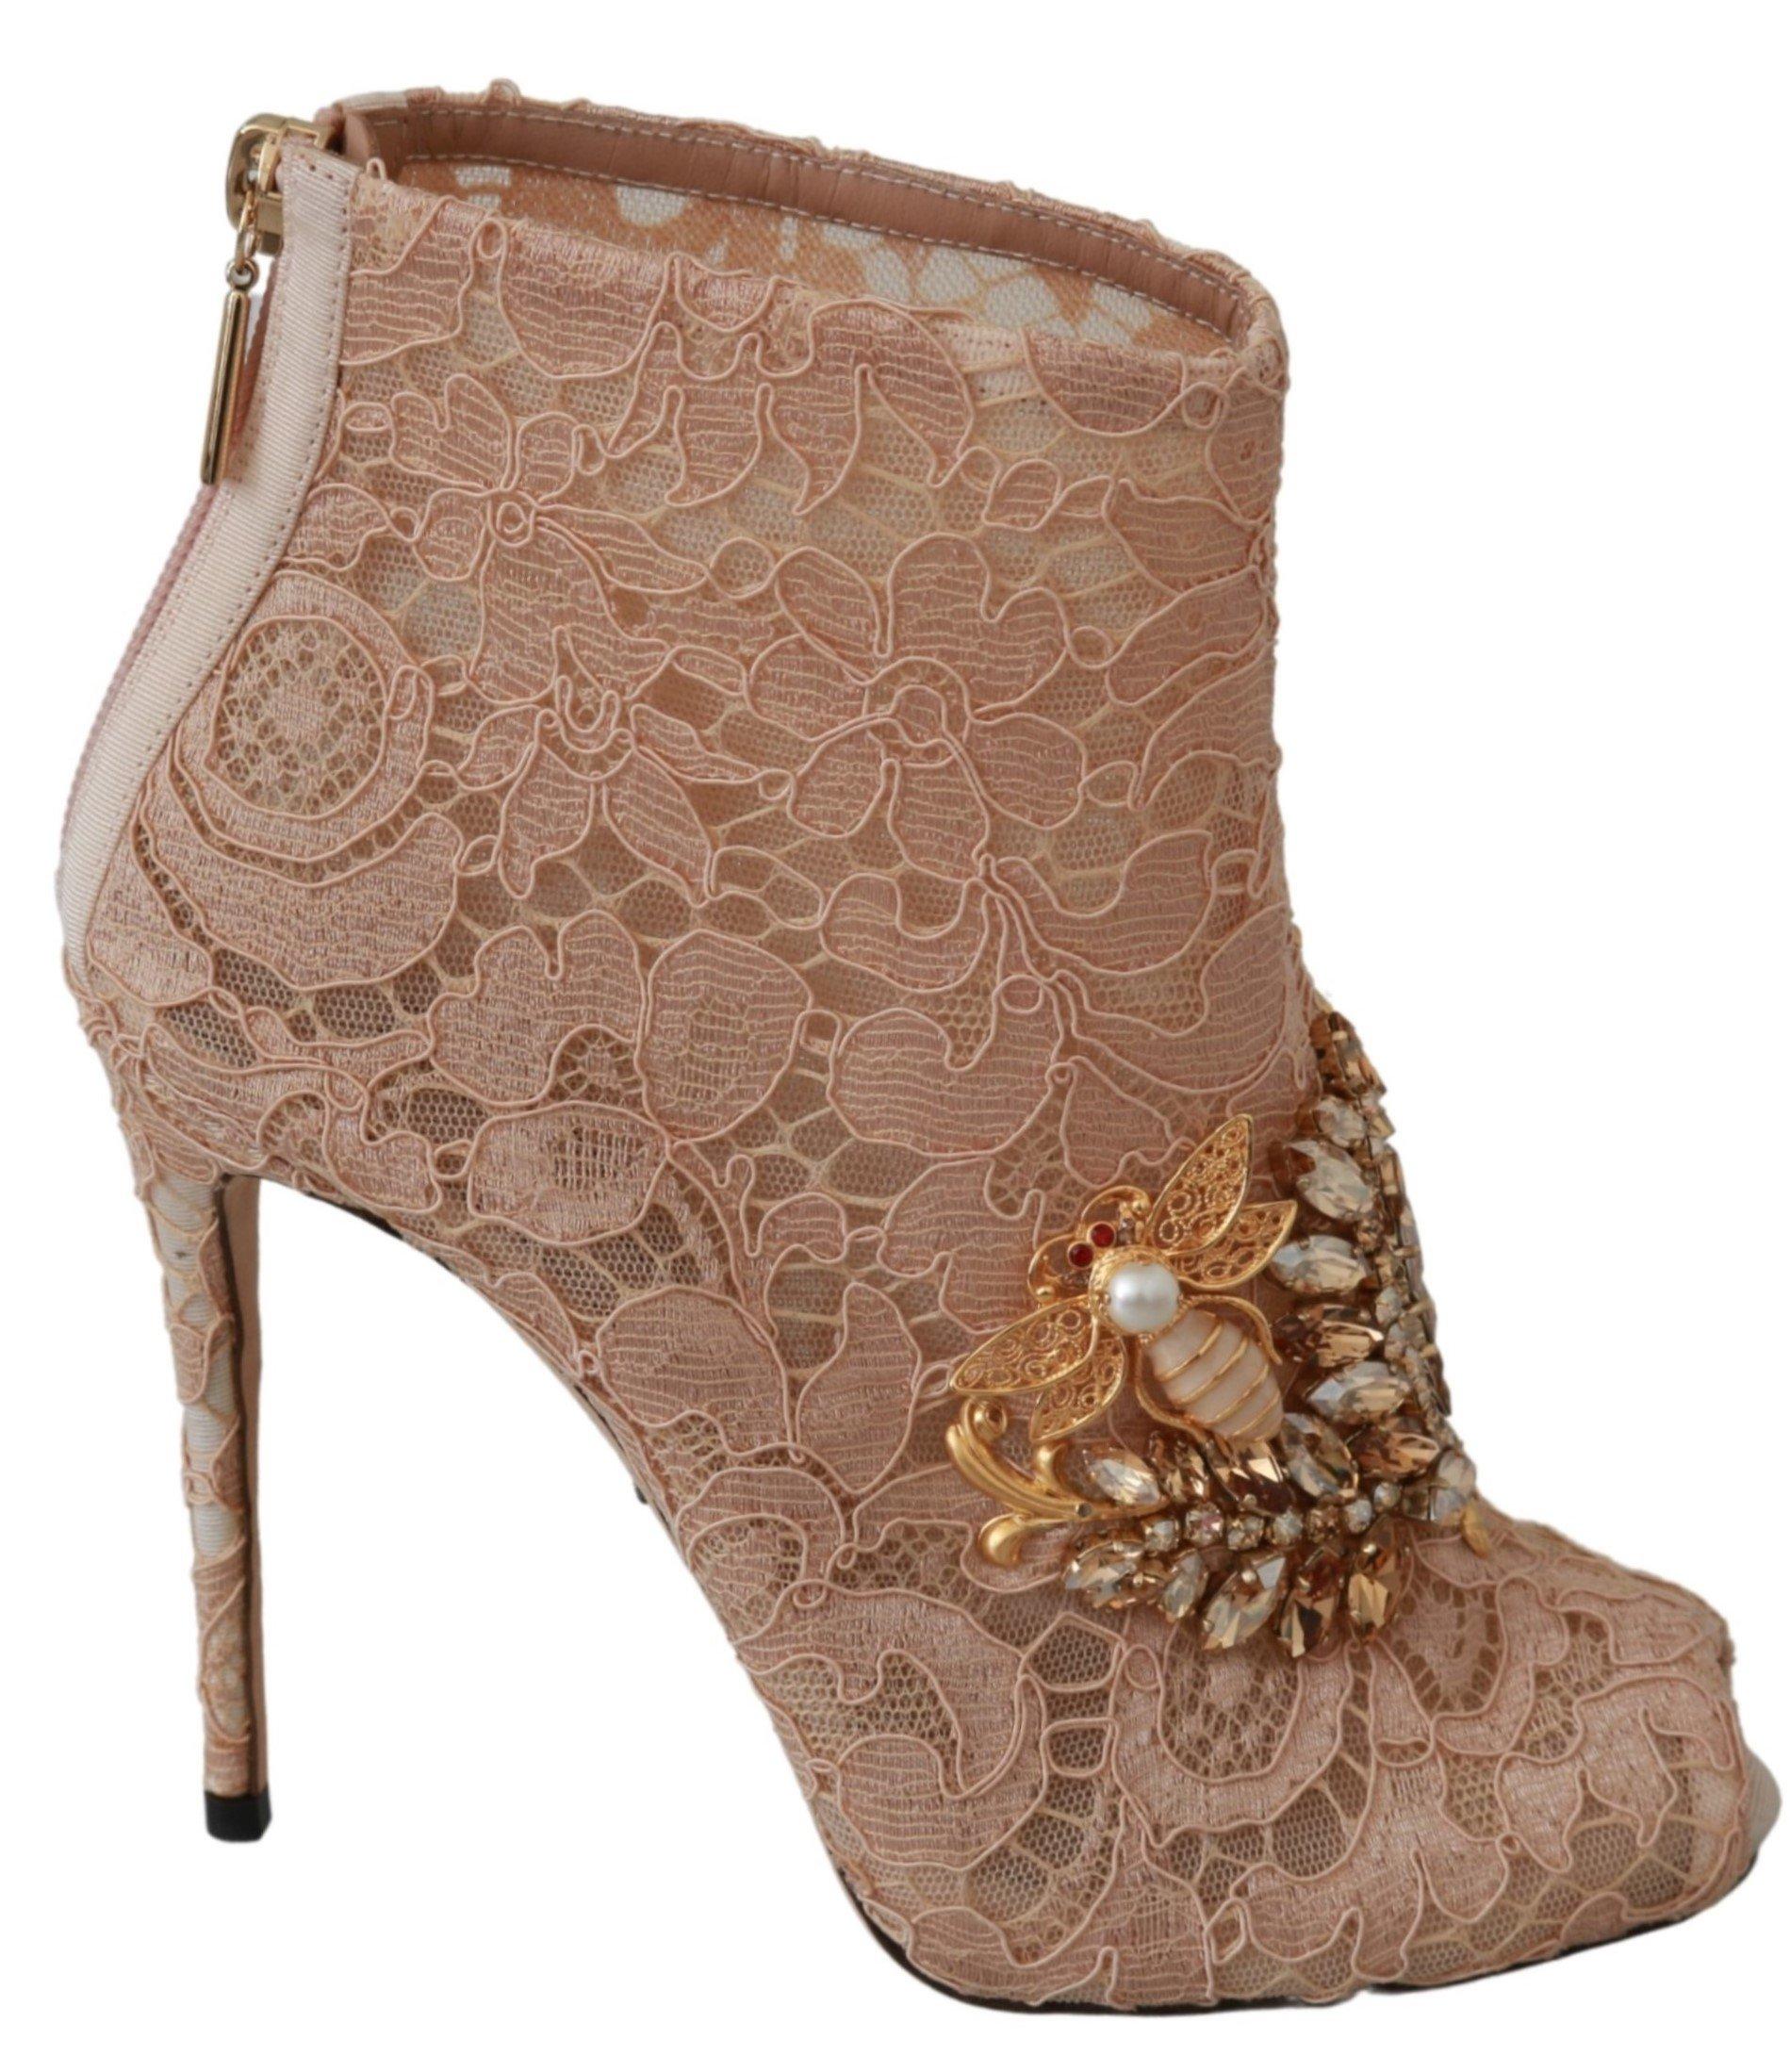 Dolce & Gabbana Women's Crystal Lace Booties Sandal Pink LA6493 - EU36/US5.5